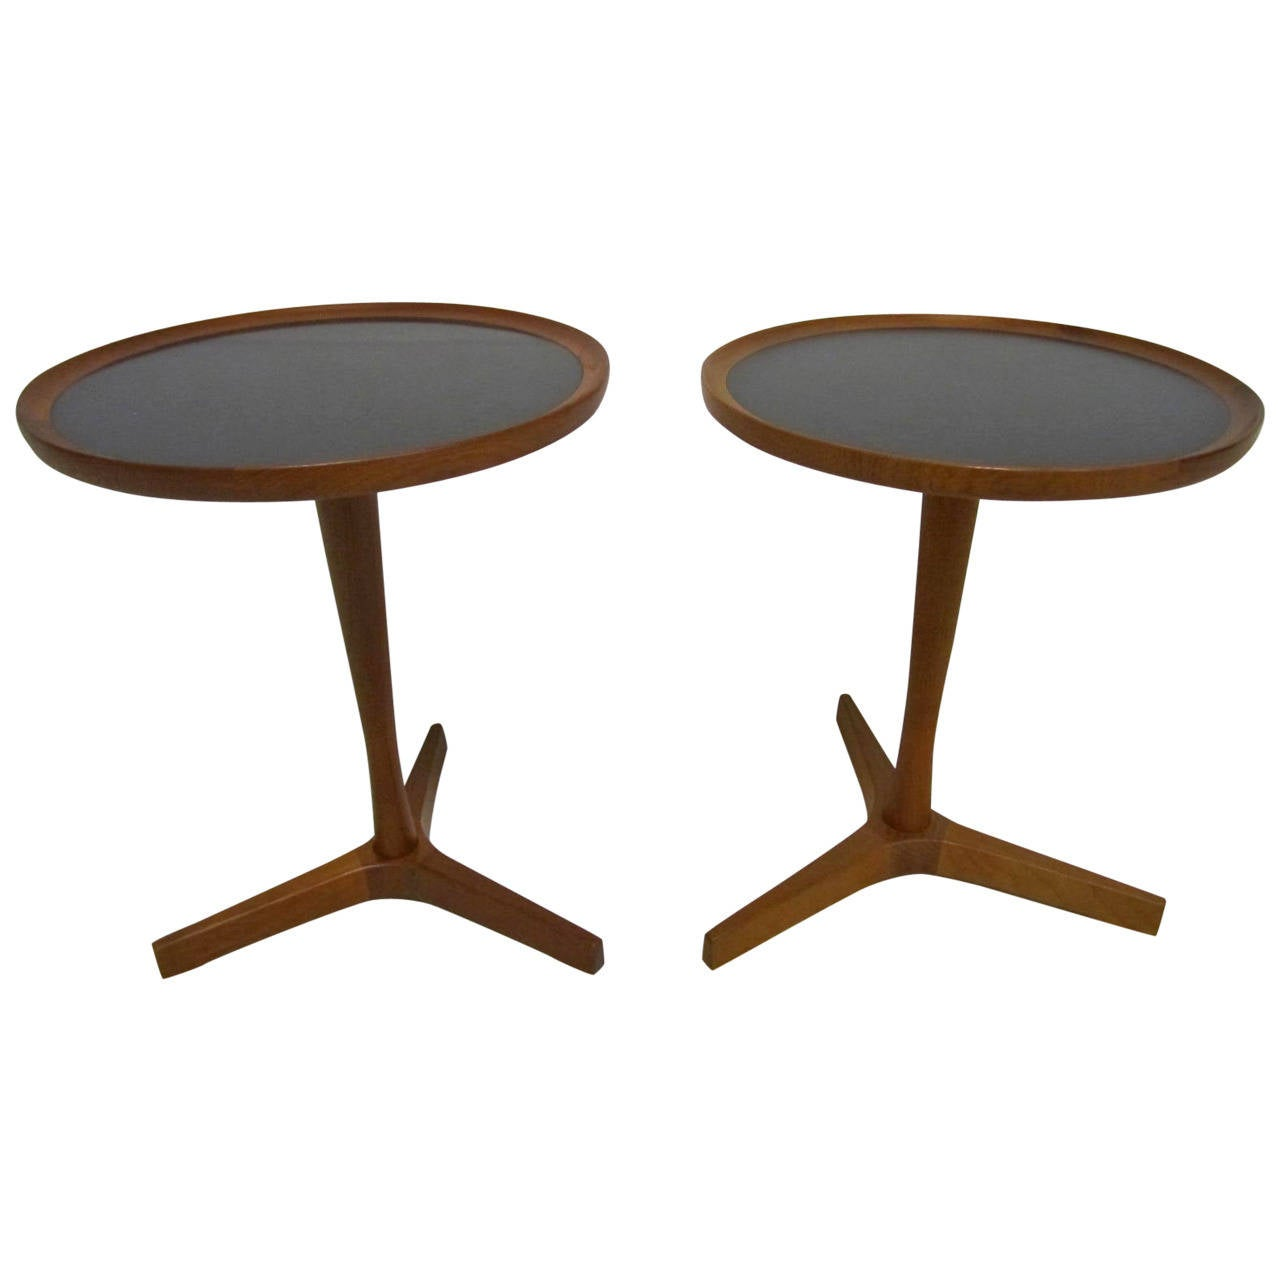 Excellent Pair Of 1950s Hans C. Andersen Teak Side Tables, Mid Century  Modern